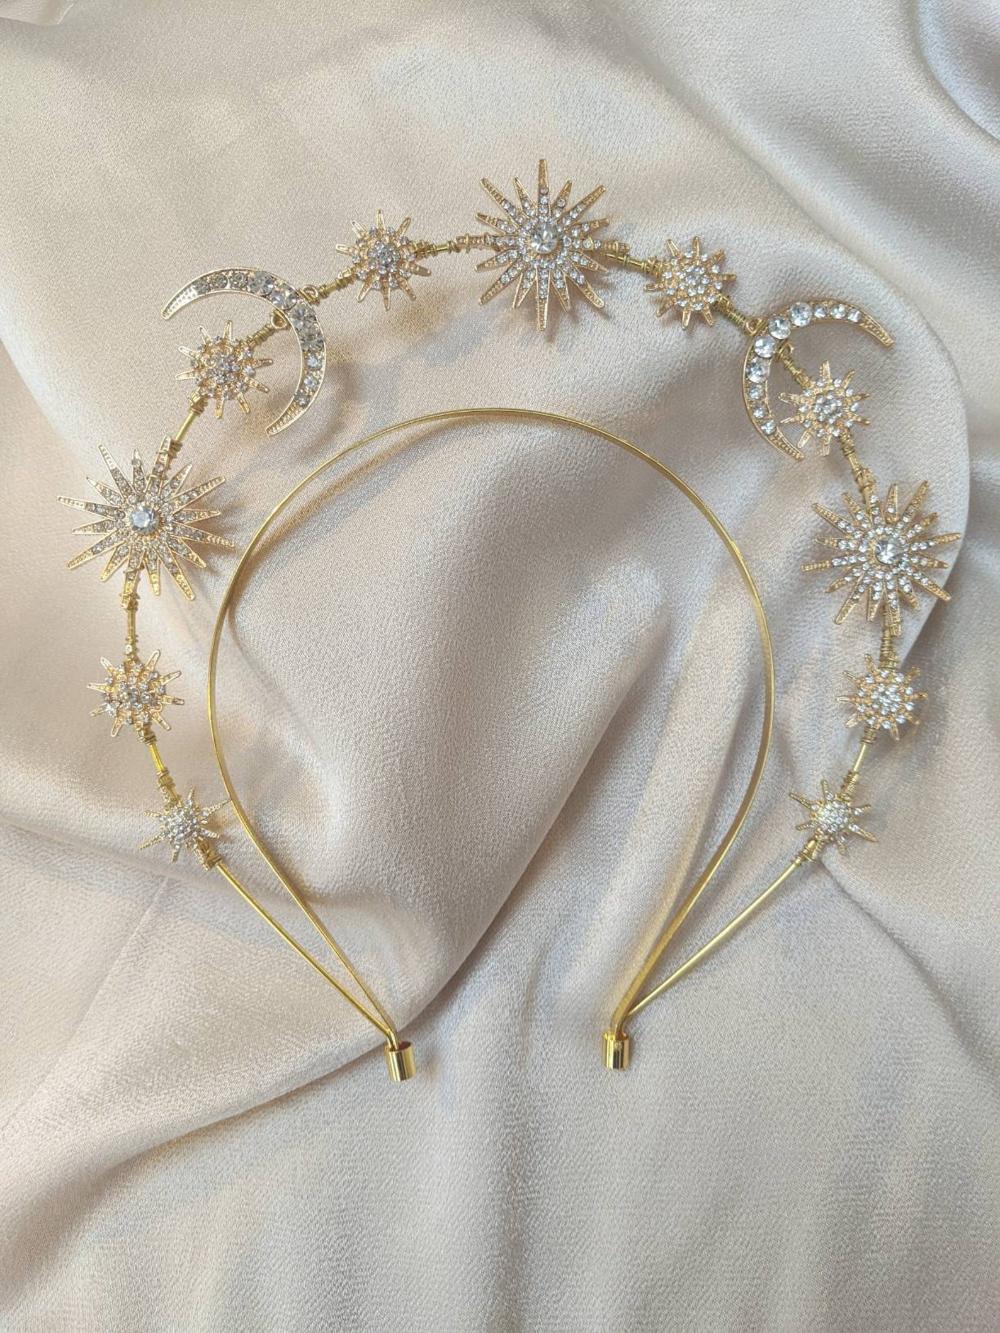 Gold Galaxy Halo Crown Gold Halo Crown Gold Headband Gold Etsy In 2020 Crystal Headband Gold Headband Silver Headband